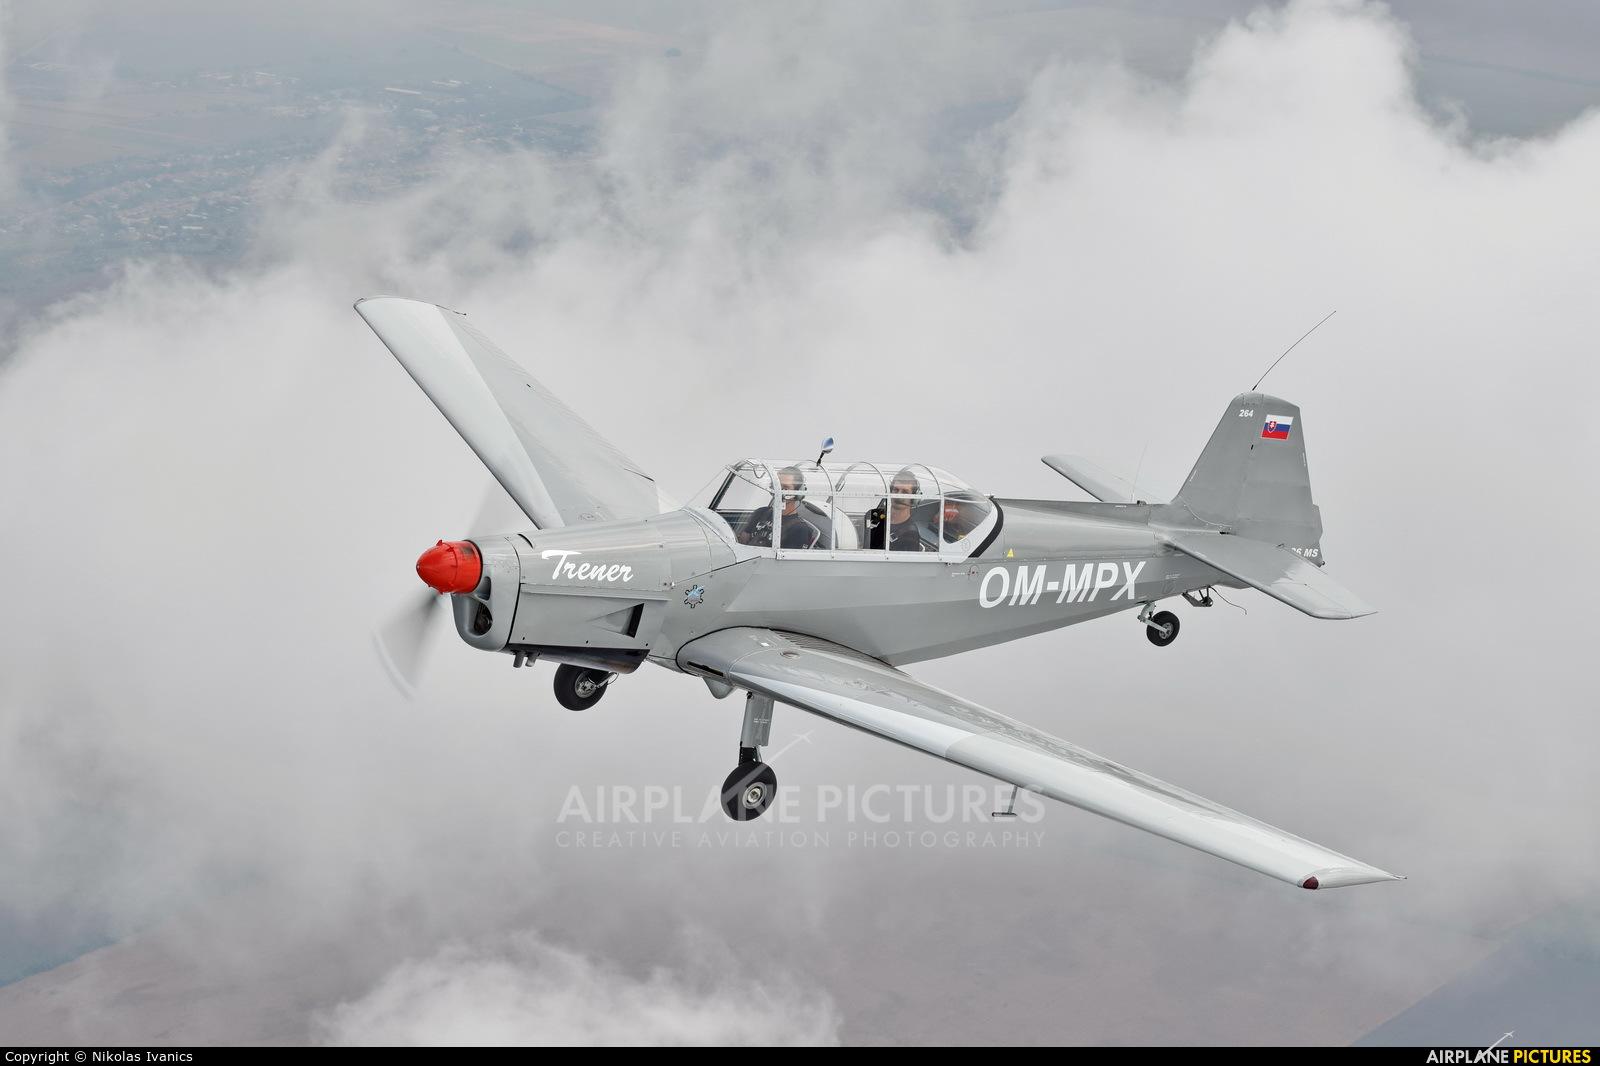 Aeroklub Nové Zámky OM-MPX aircraft at Nové Zámky